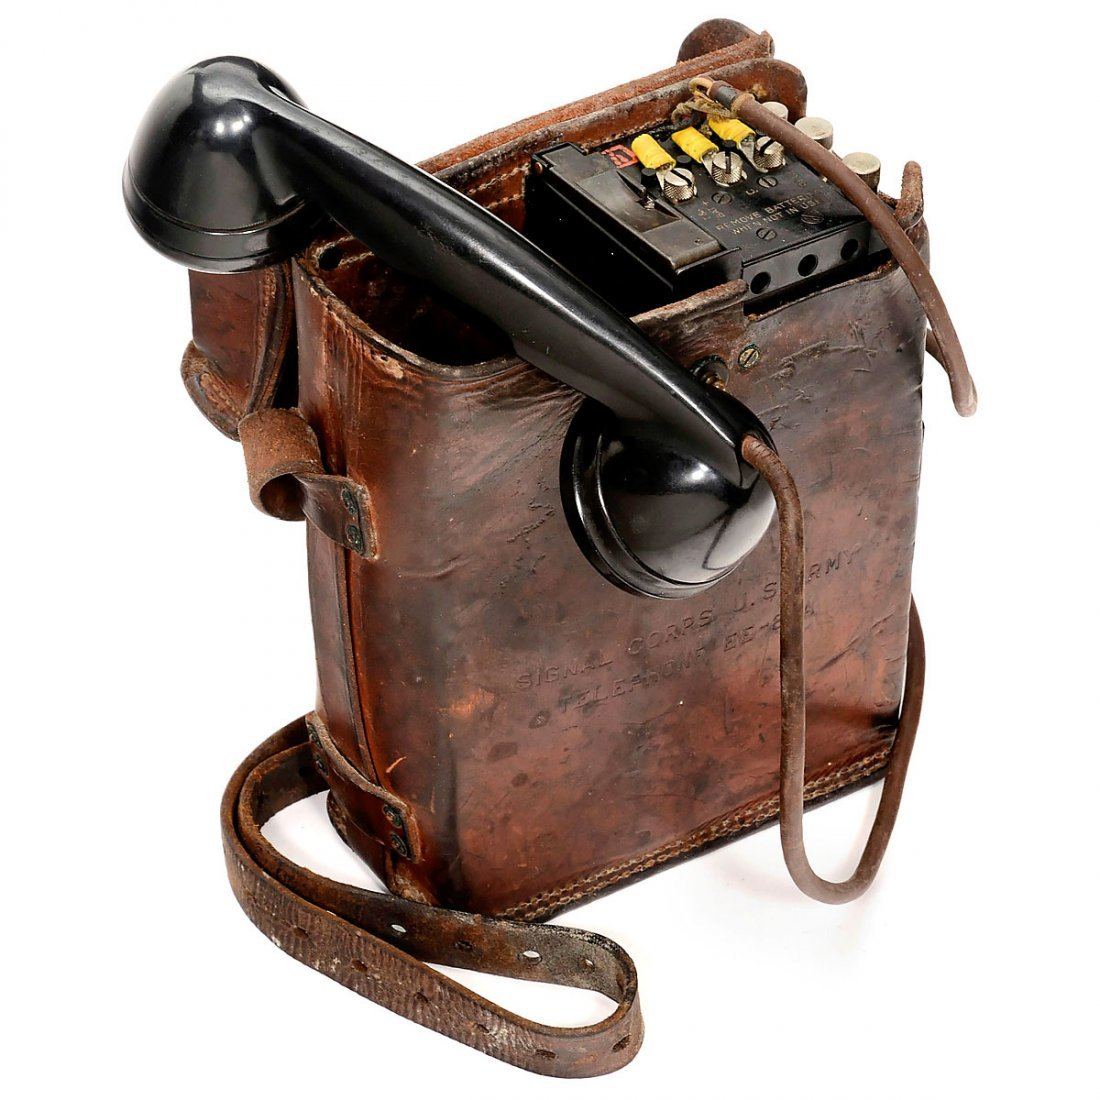 EE-8-A American Military Field Telephone, c. 1940